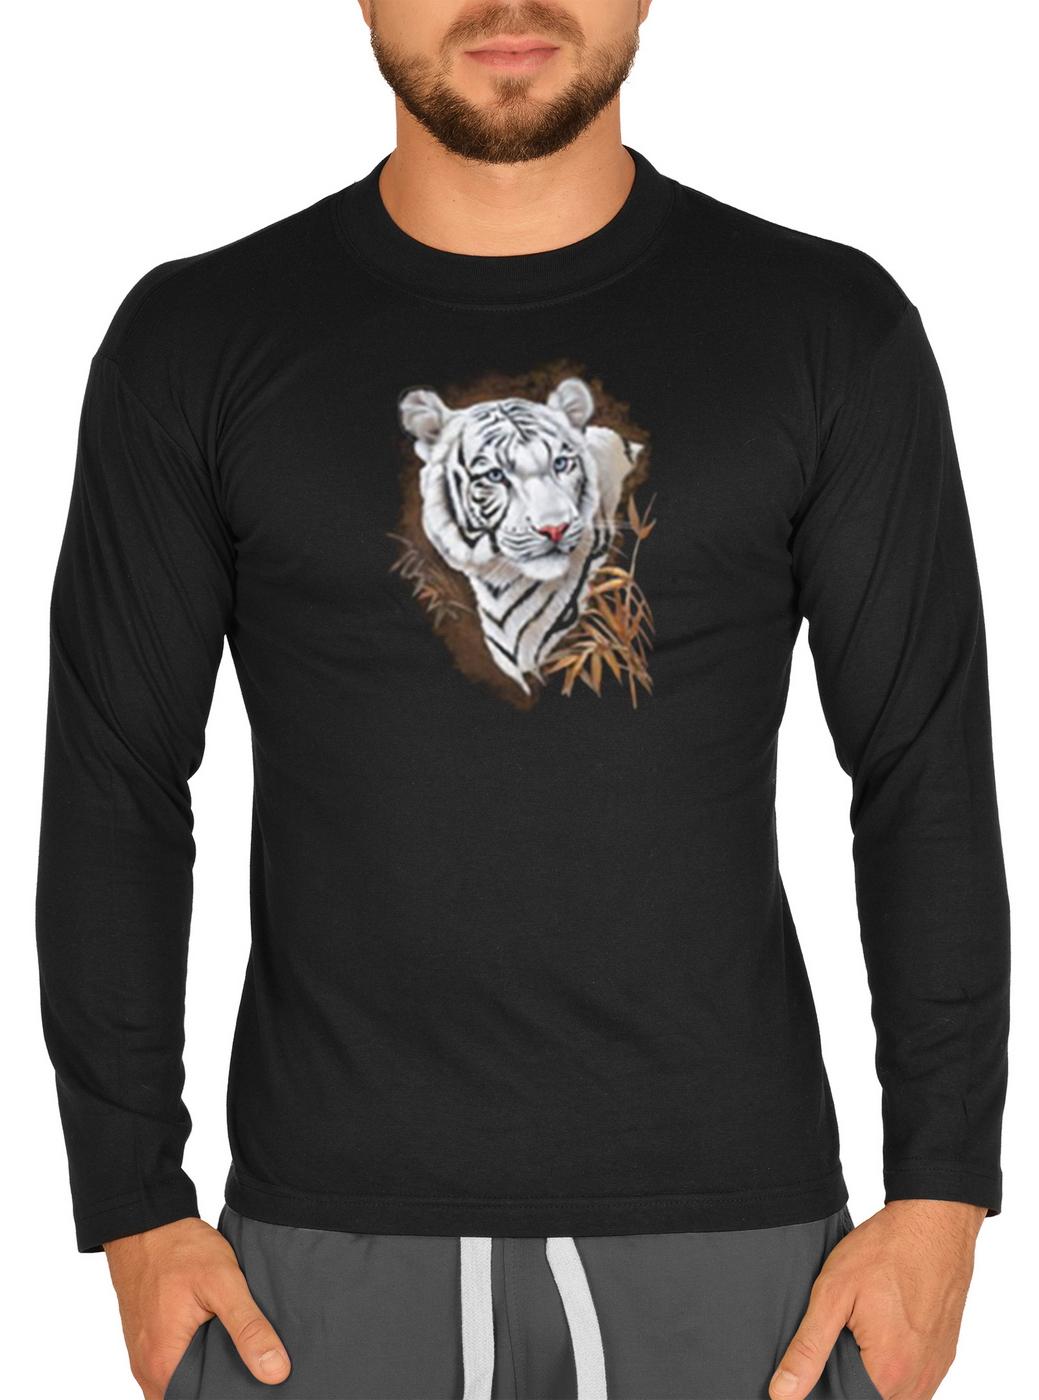 langarmshirt herren wei er tiger goodman shirt fun t. Black Bedroom Furniture Sets. Home Design Ideas